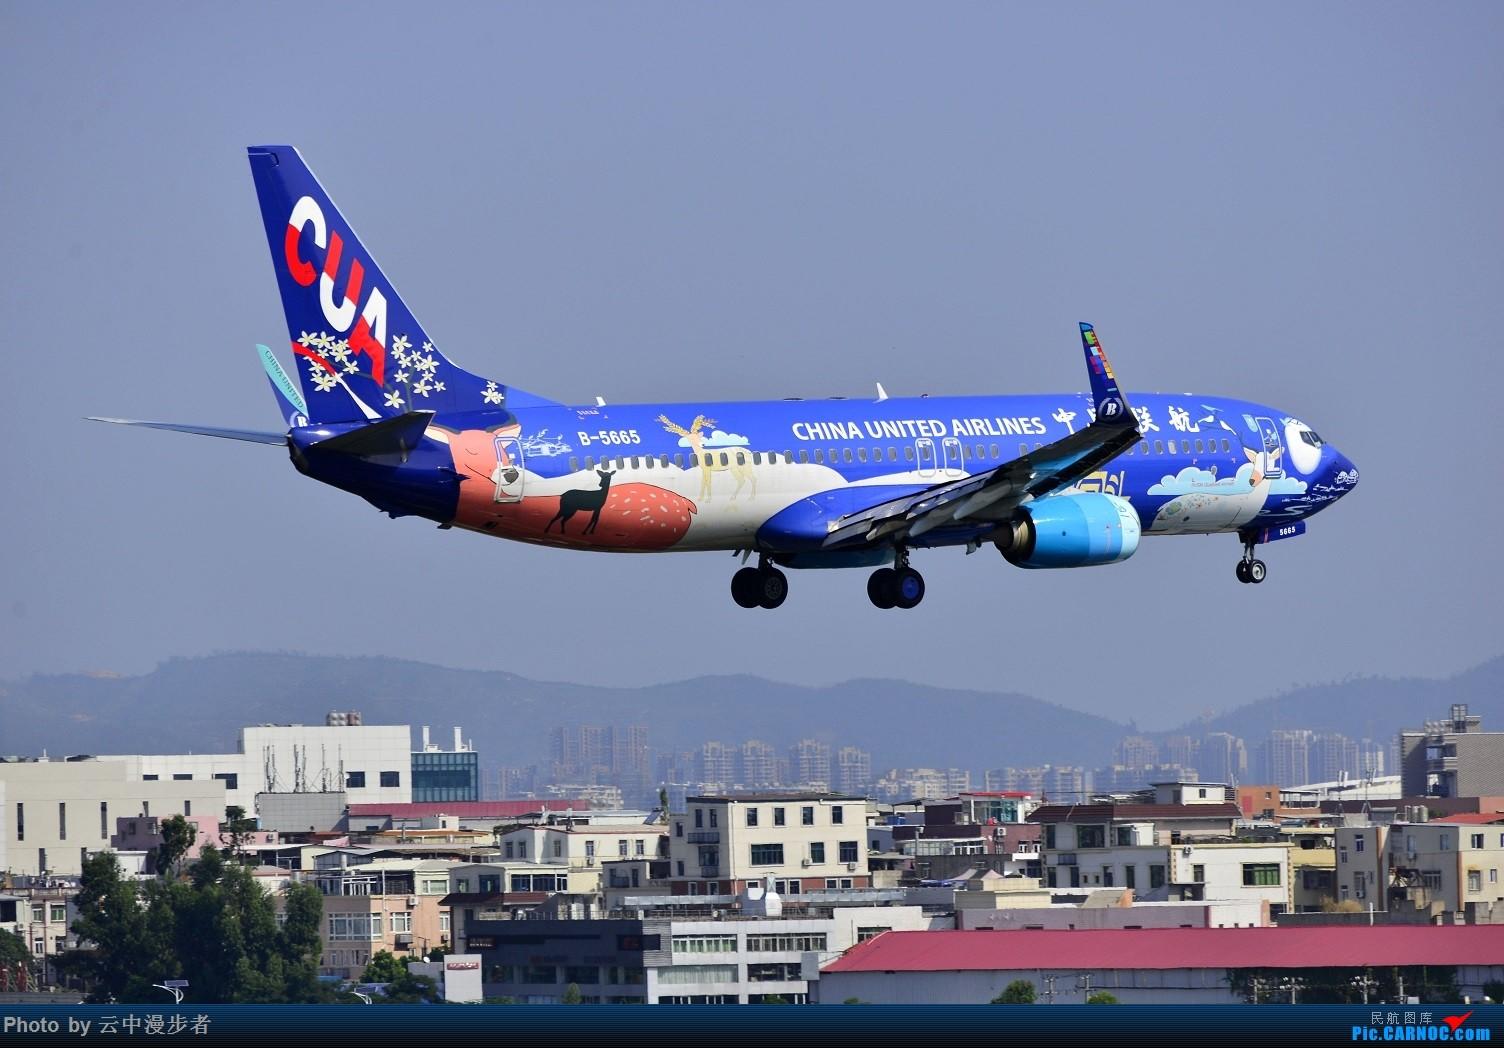 Re:[原创]双节前狠狠地拍了一天的机 BOEING 737-800 B-5665 中国厦门高崎国际机场